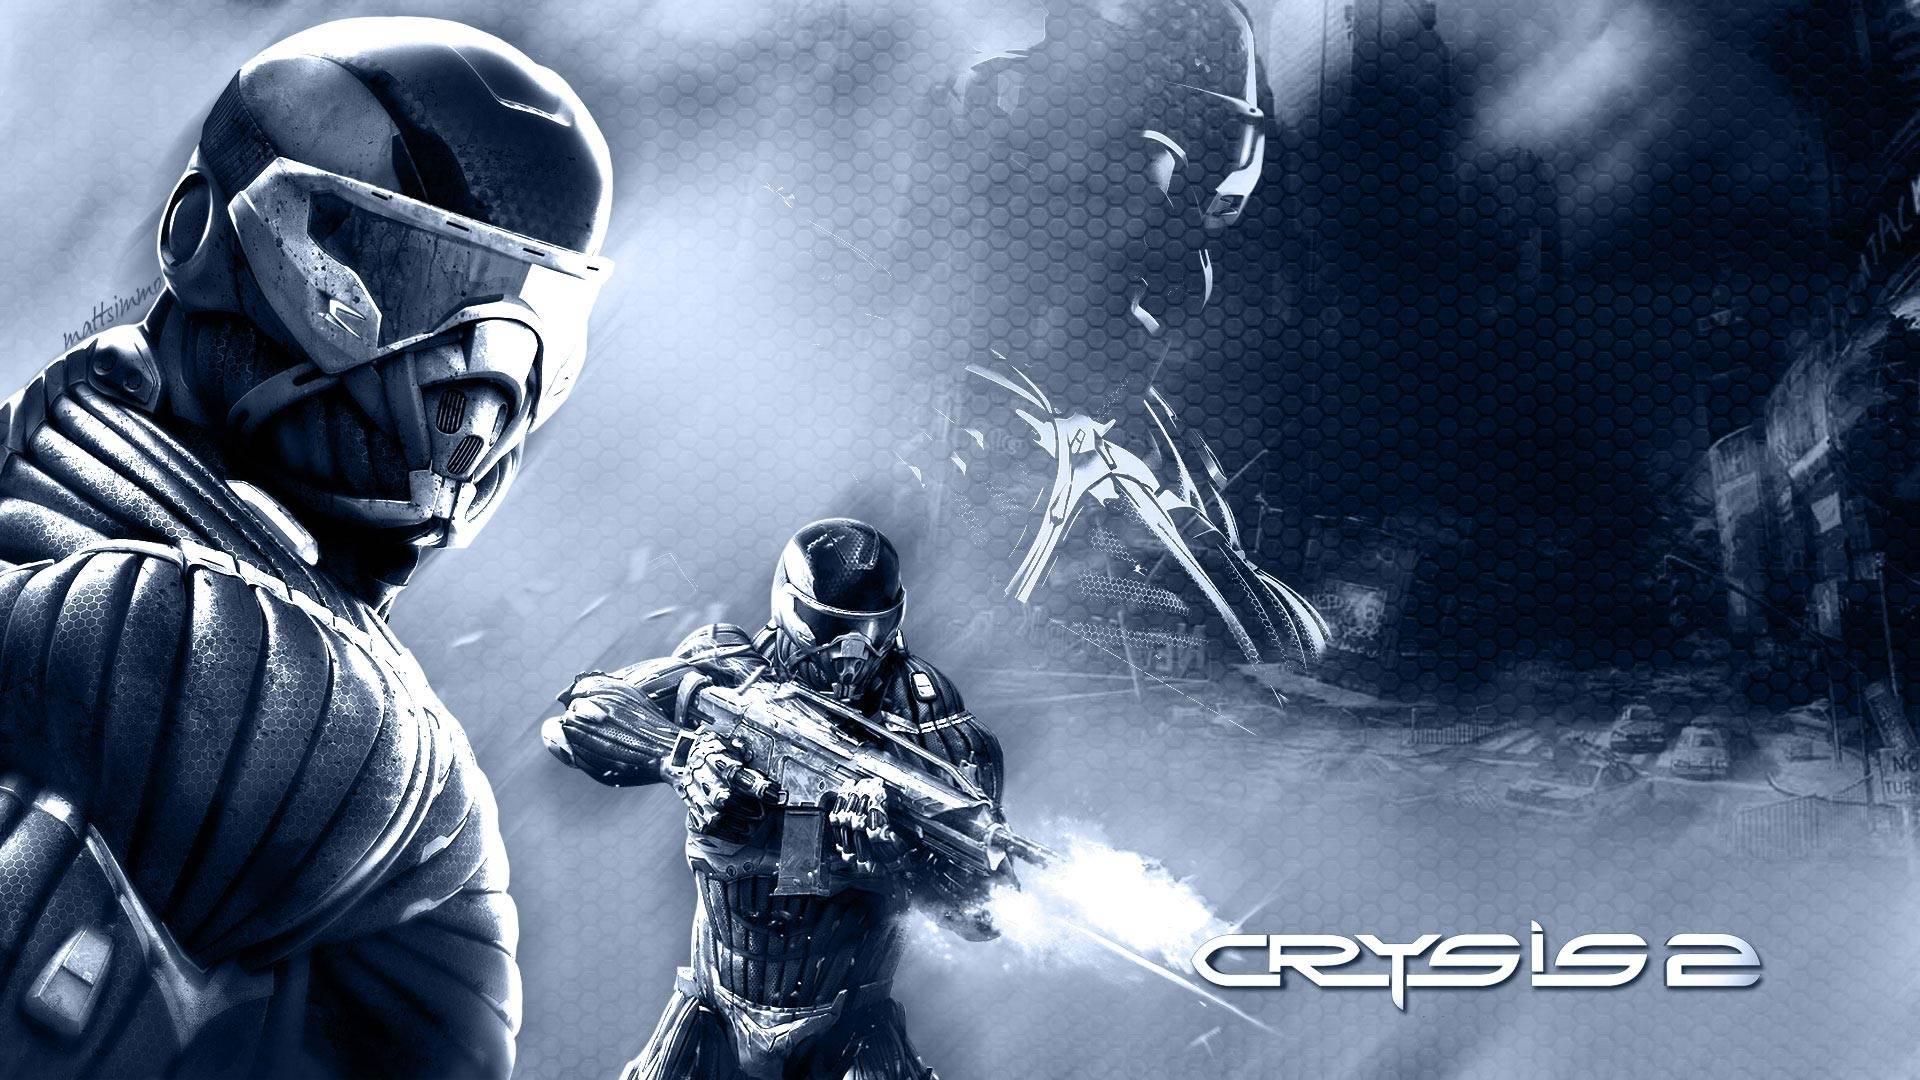 Crysis 2 Wallpaper Full HD 1080P PS3 1920x1080